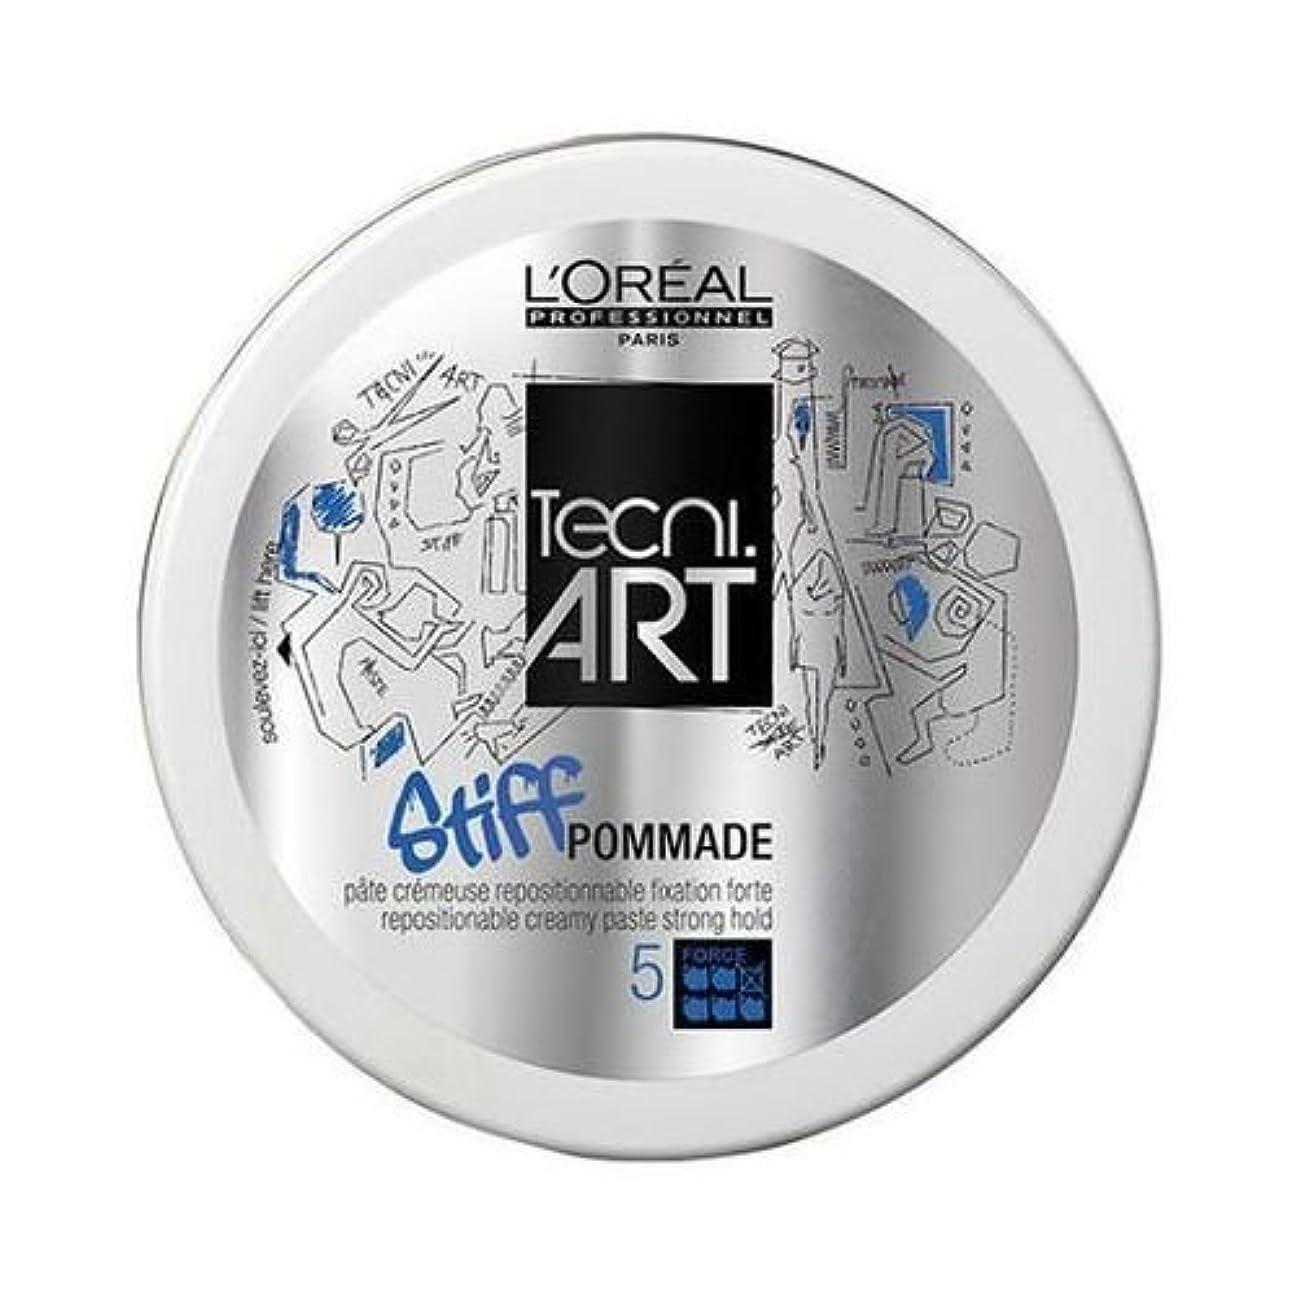 散逸病気対人L'Oreal Tecni Art Stiff Pommade 75 ml [並行輸入品]